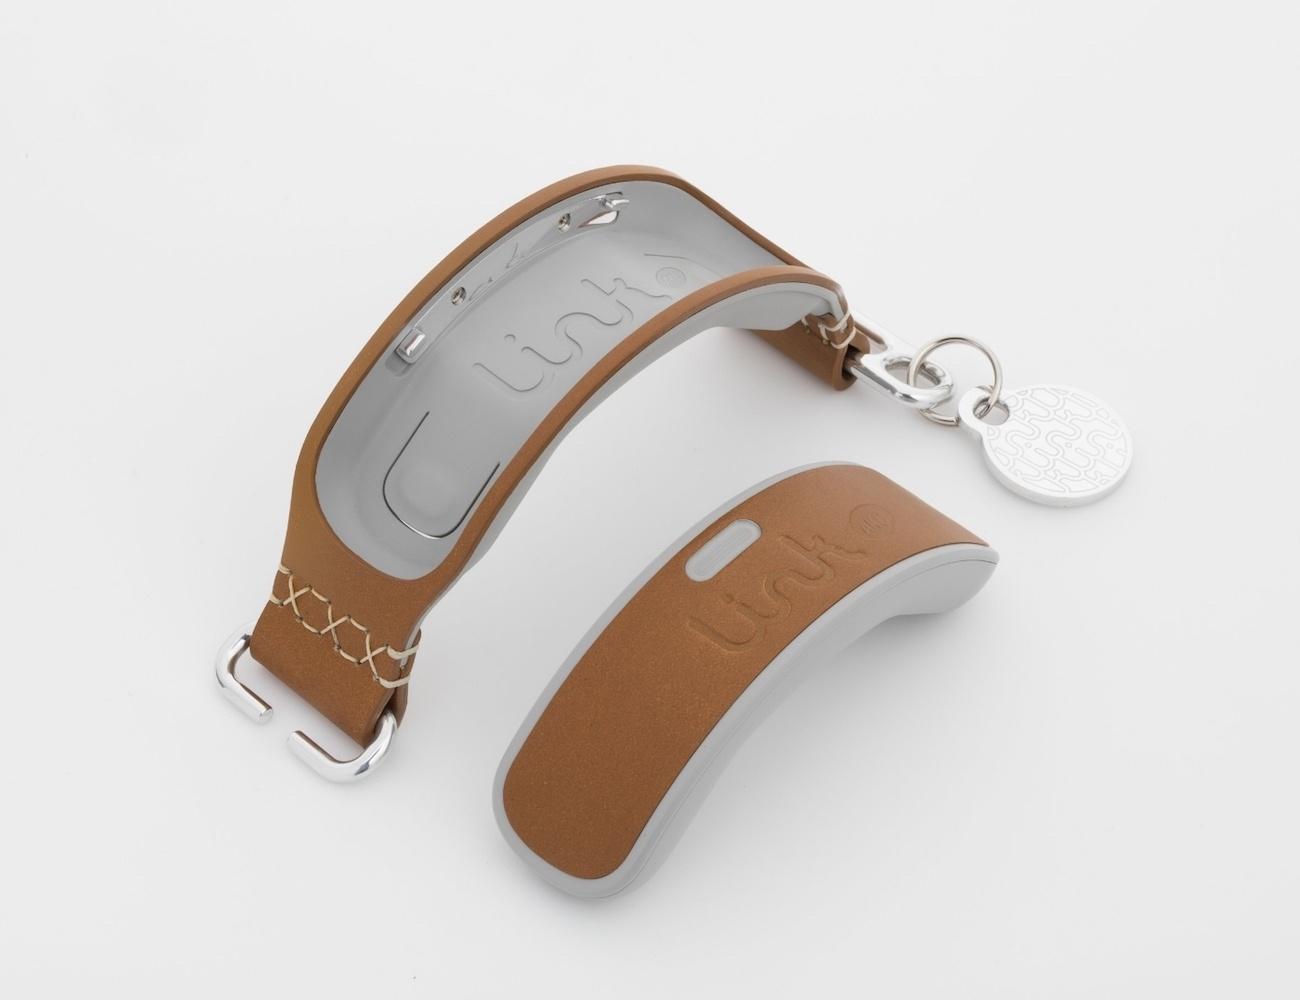 LINK AKC Intelligent Dog Collar